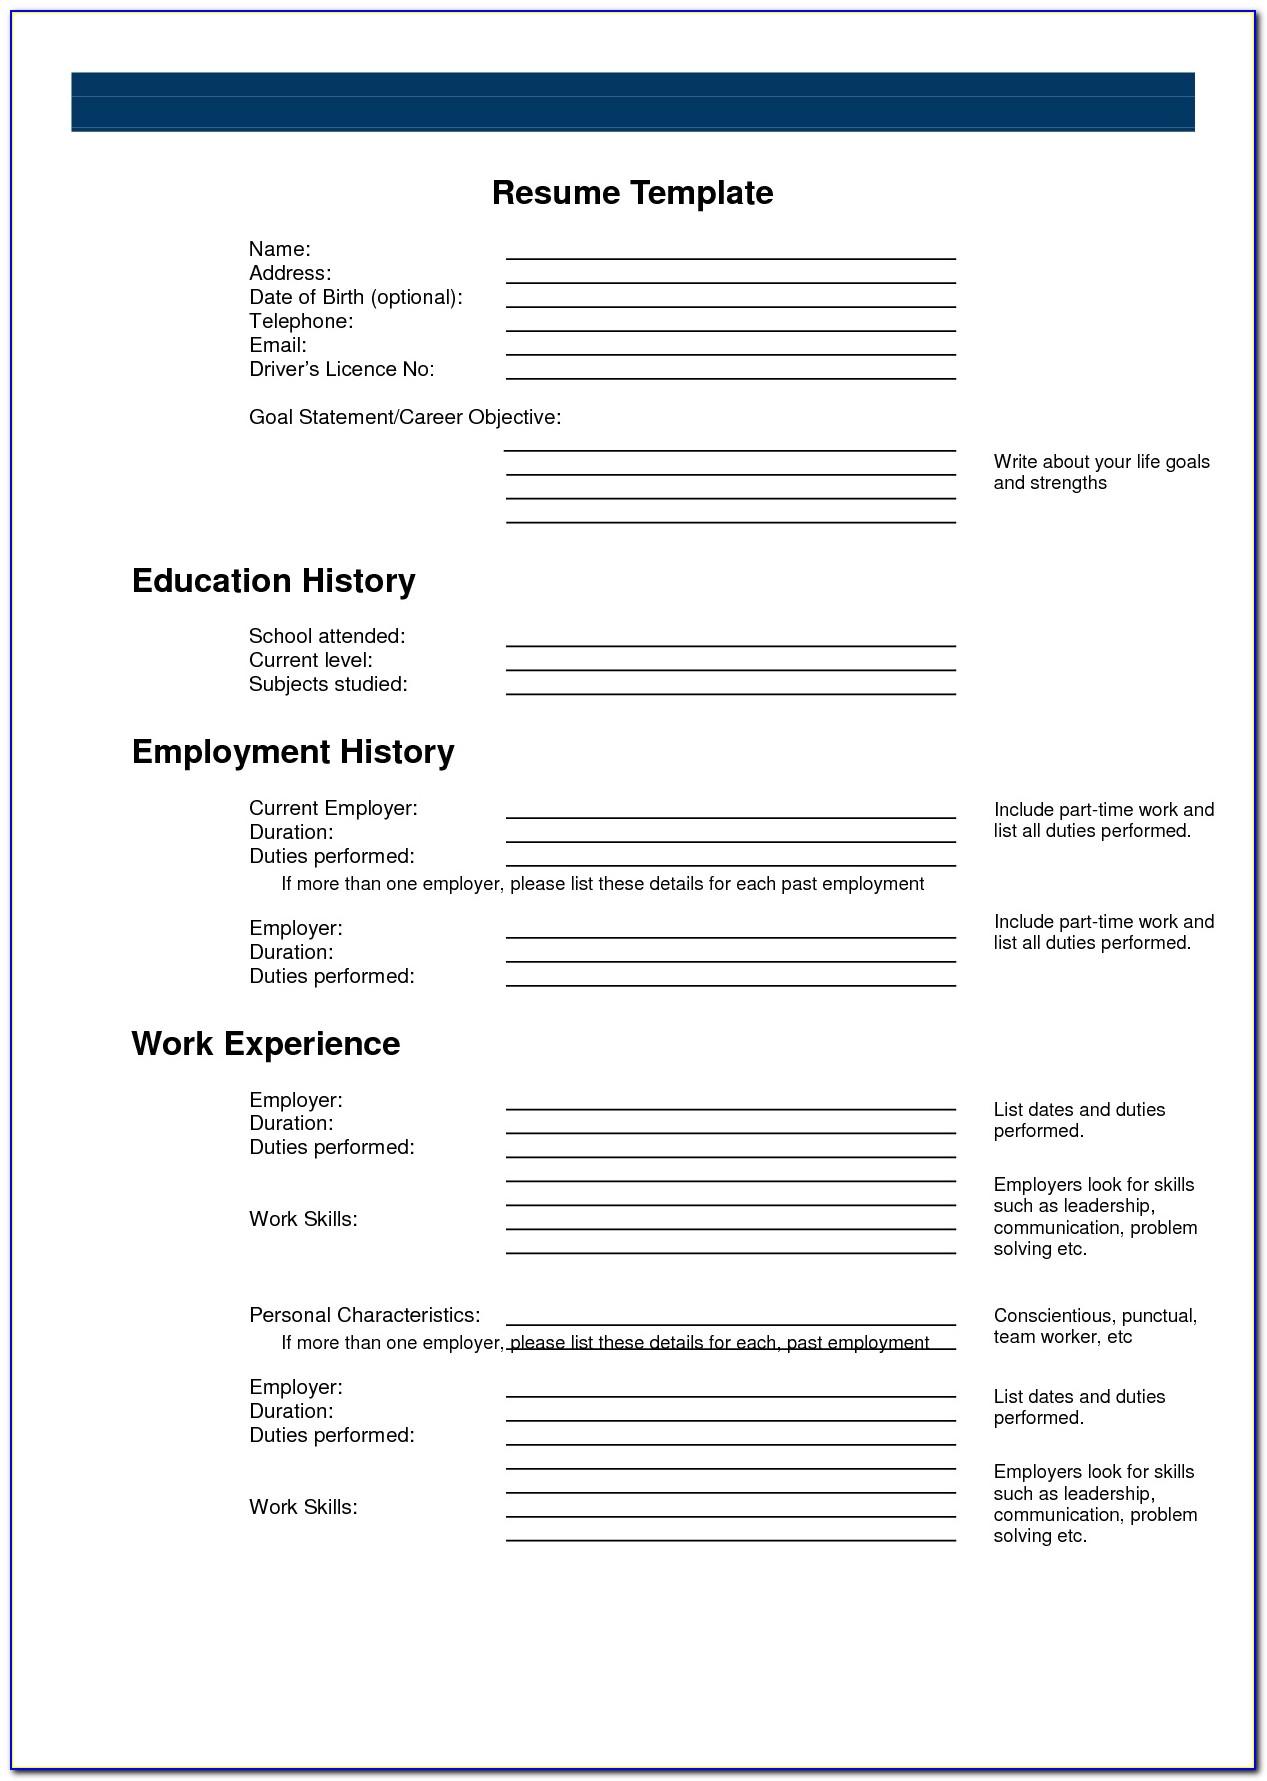 Curriculum Vitae Template Blank